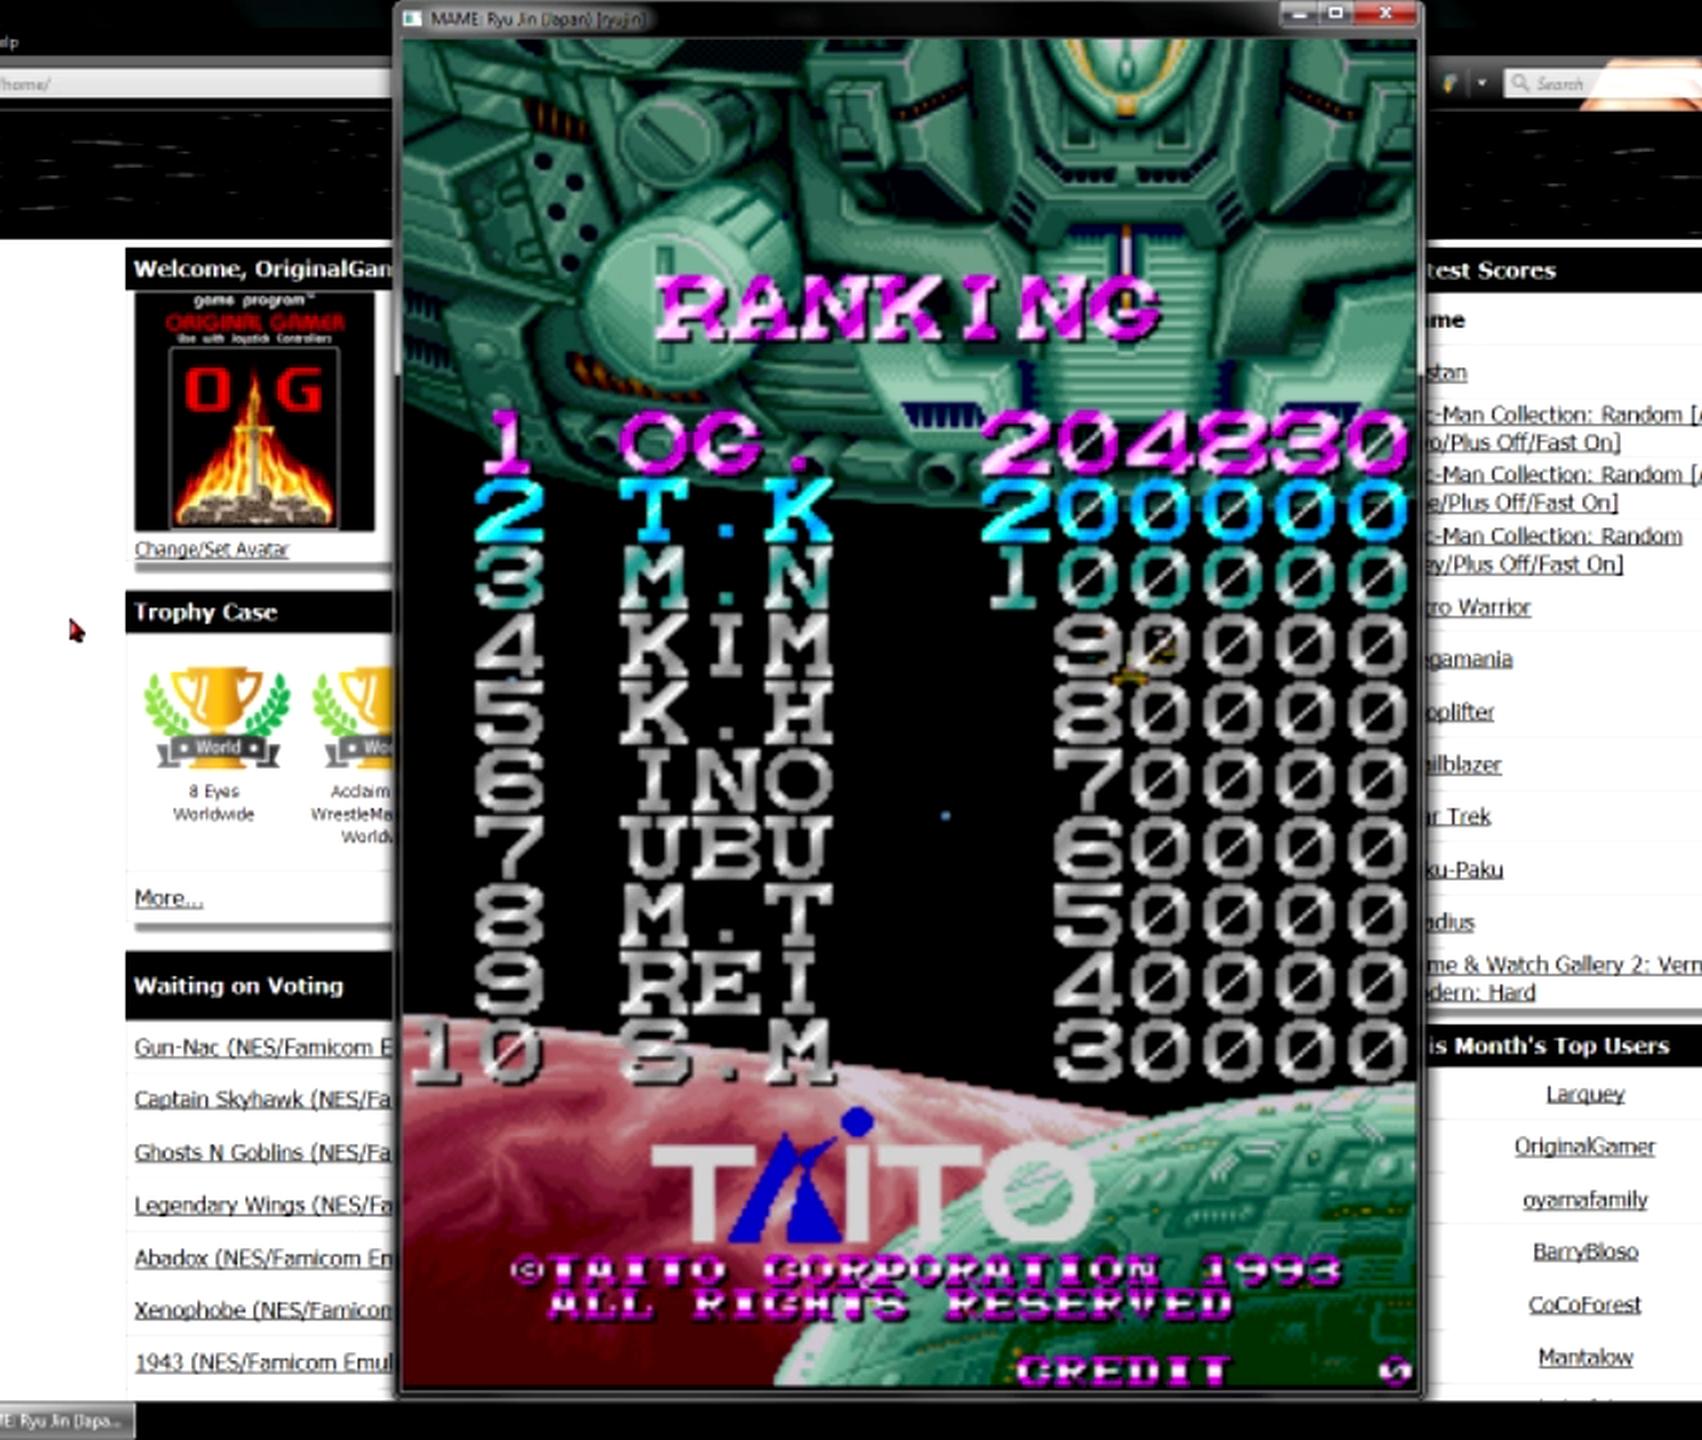 OriginalGamer: Ryu Jin [ryujin] (Arcade Emulated / M.A.M.E.) 204,830 points on 2015-05-27 20:25:14